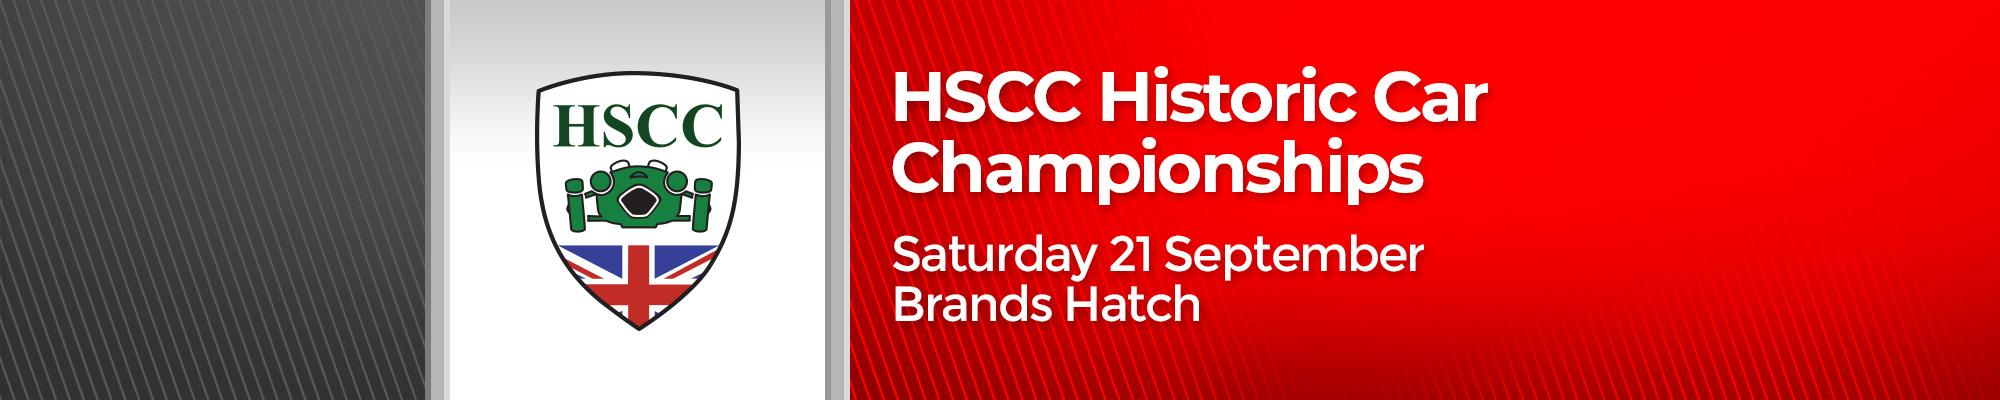 HSCC Historic Car Championships